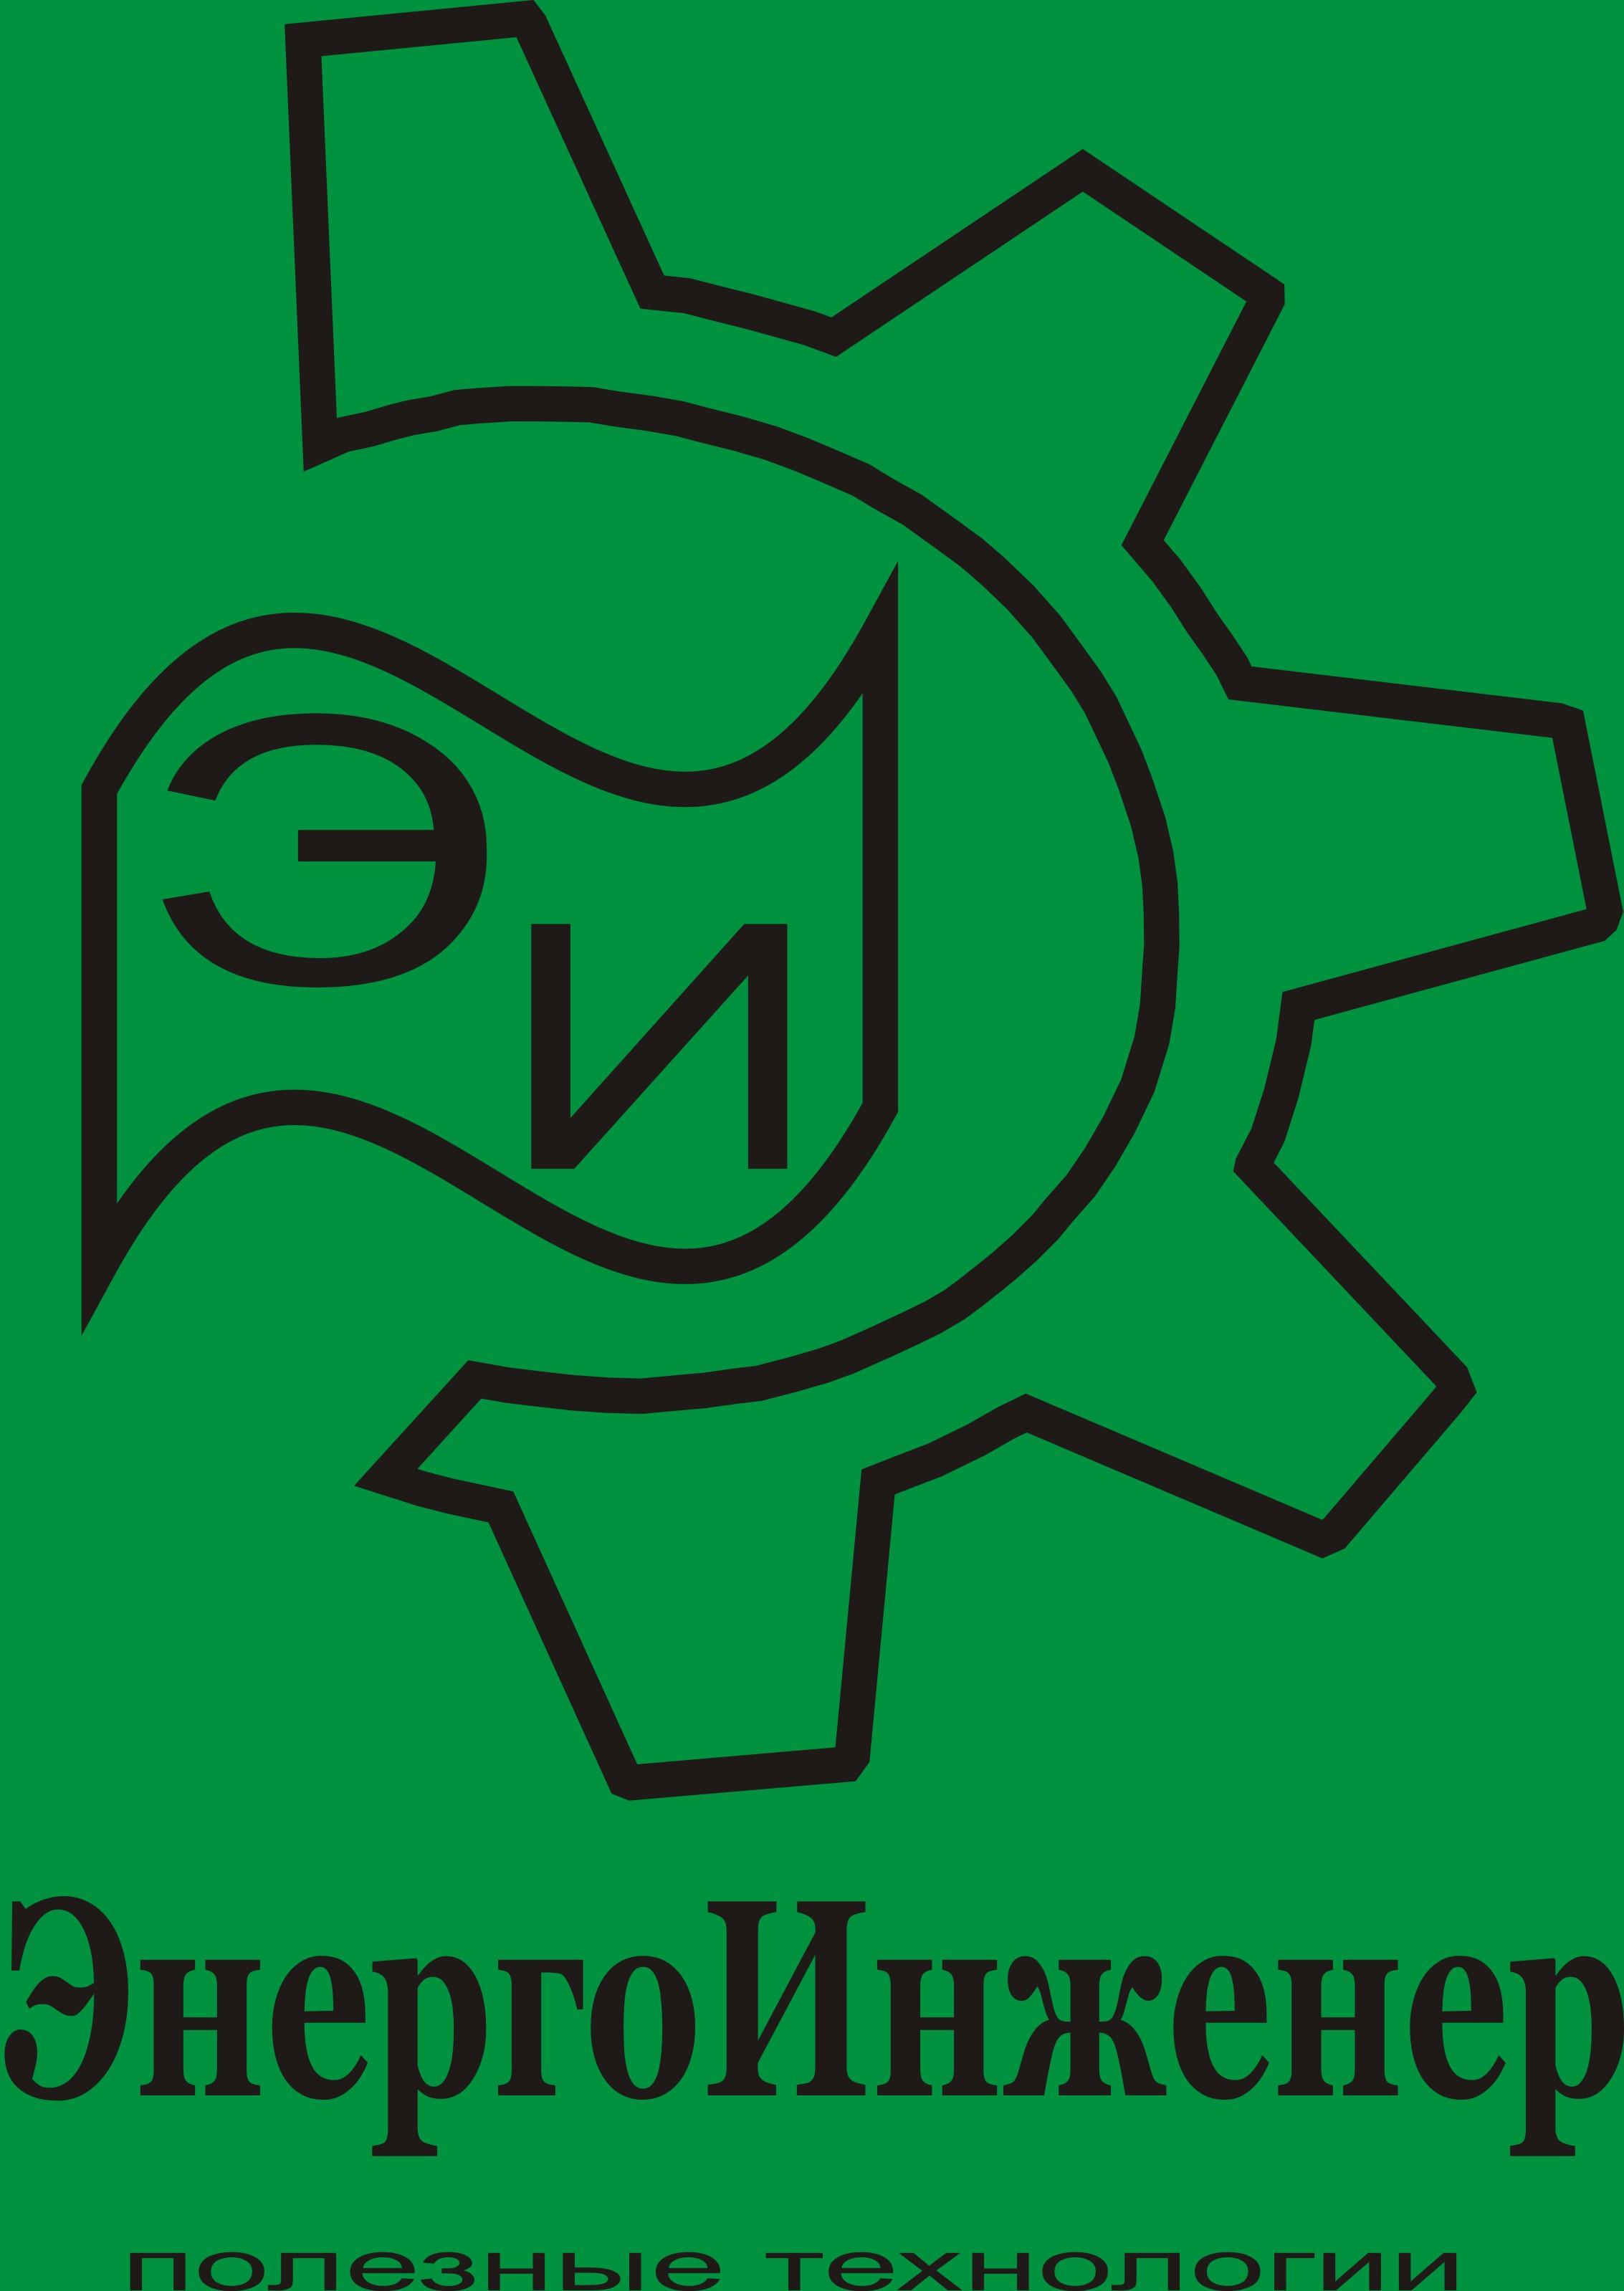 Логотип для инженерной компании фото f_91951e84249ab65e.jpg